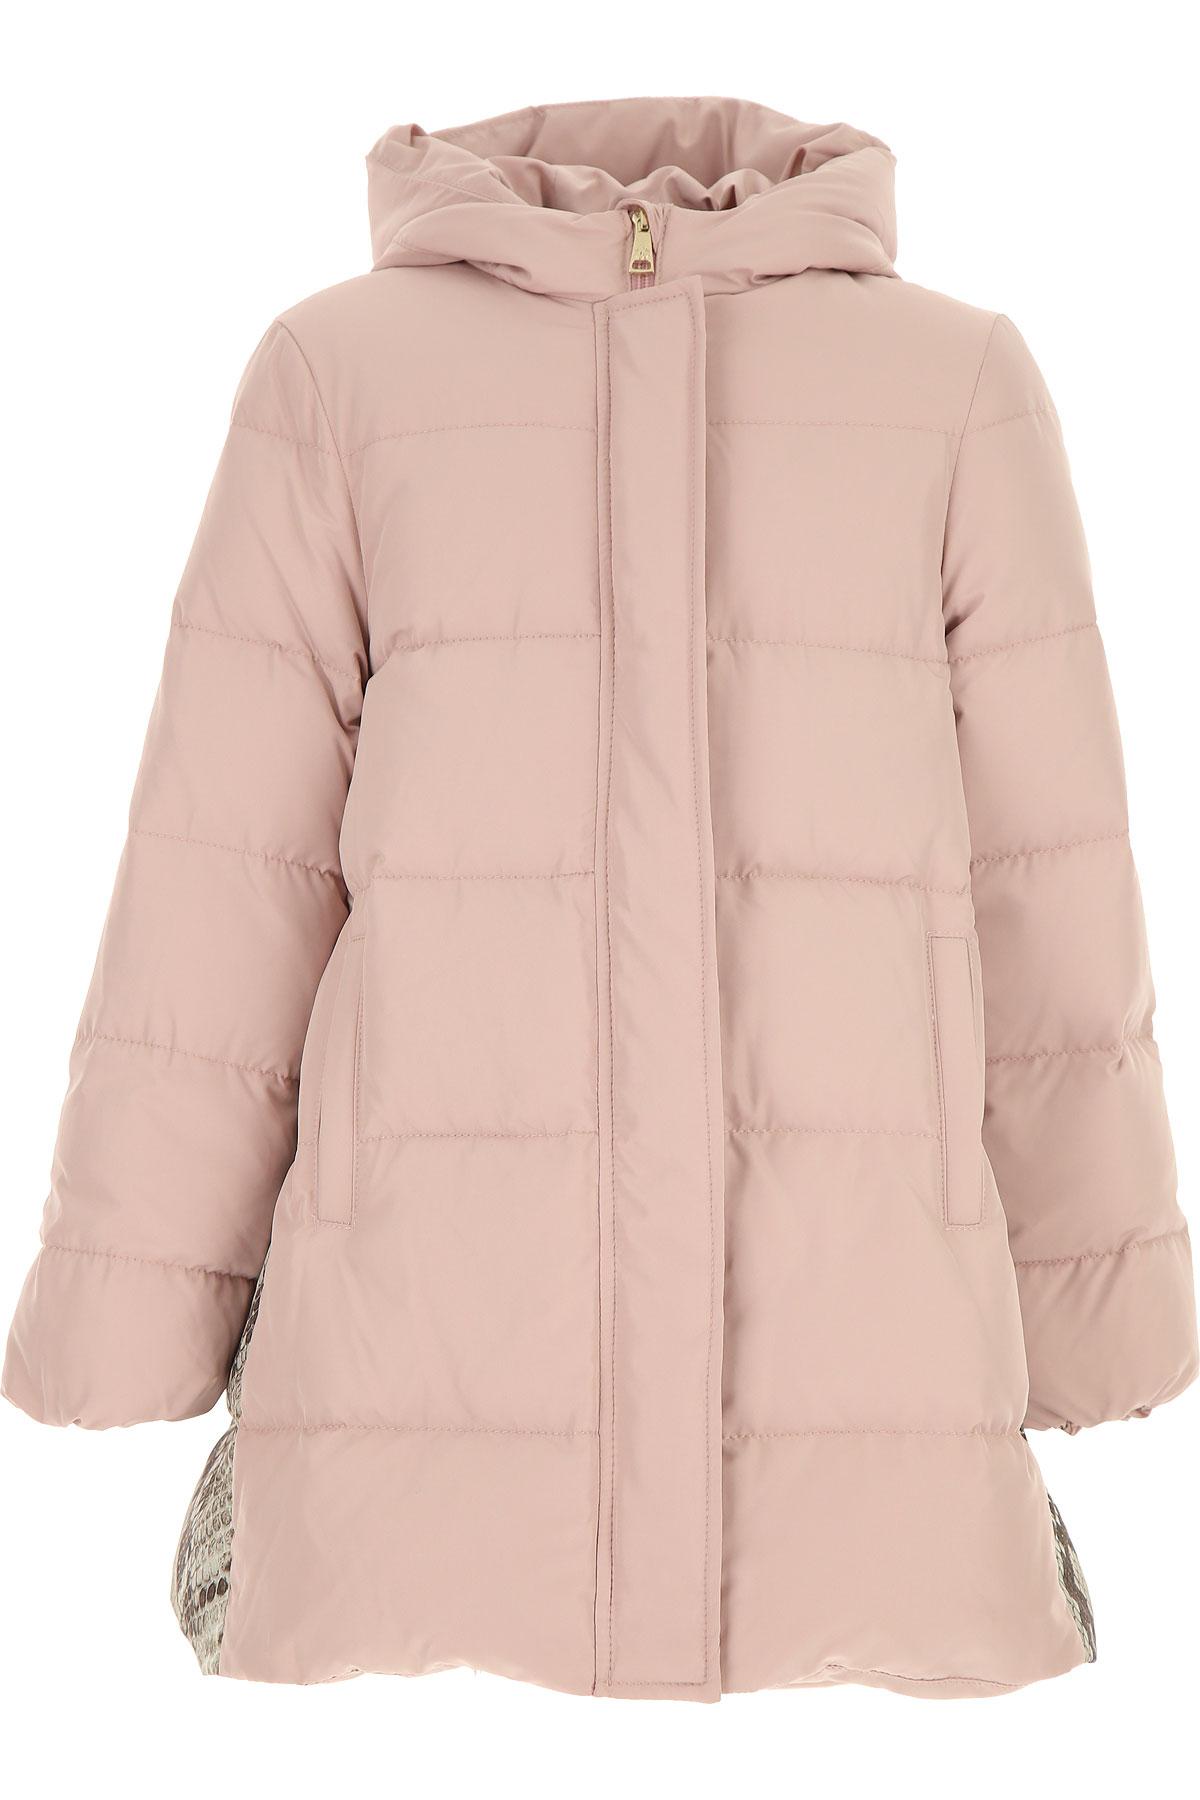 Roberto Cavalli Girls Down Jacket for Kids, Puffer Ski Jacket On Sale, Pink, polyester, 2019, L M S